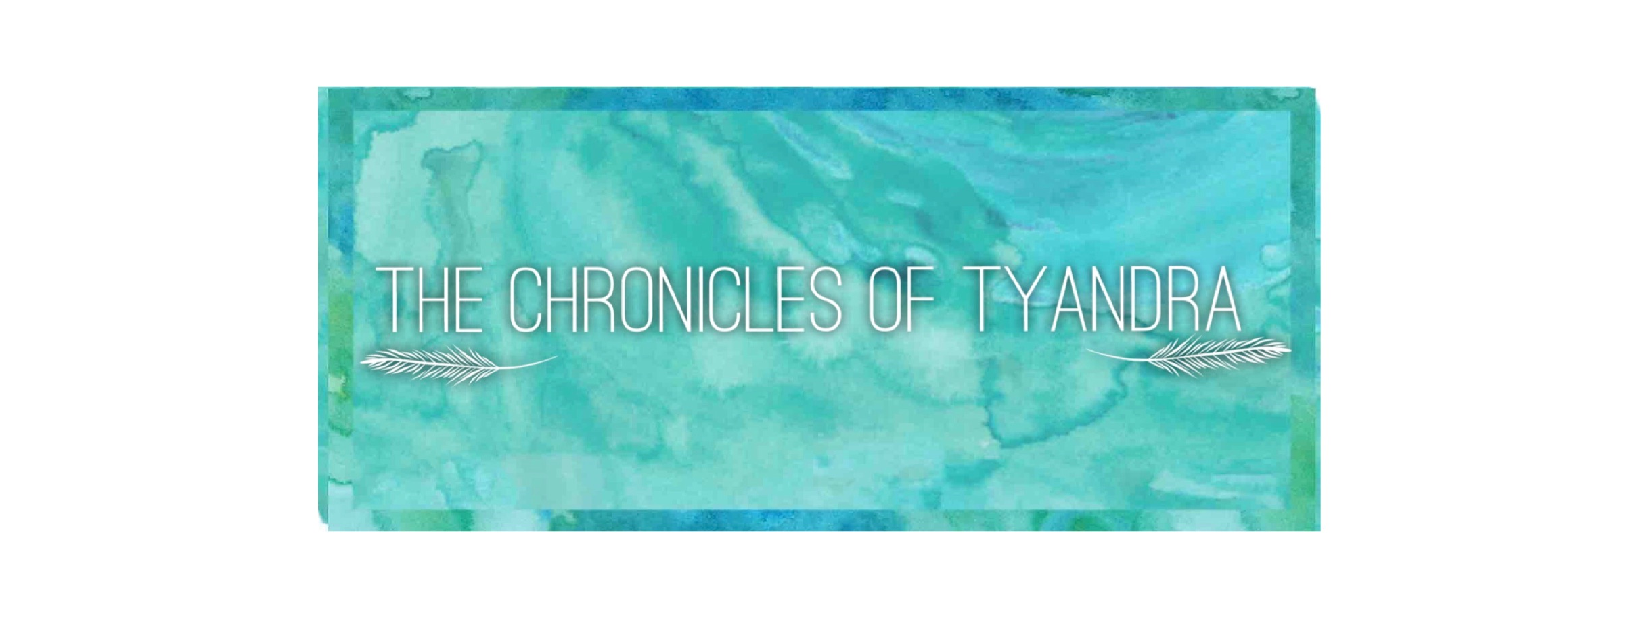 Tyandra